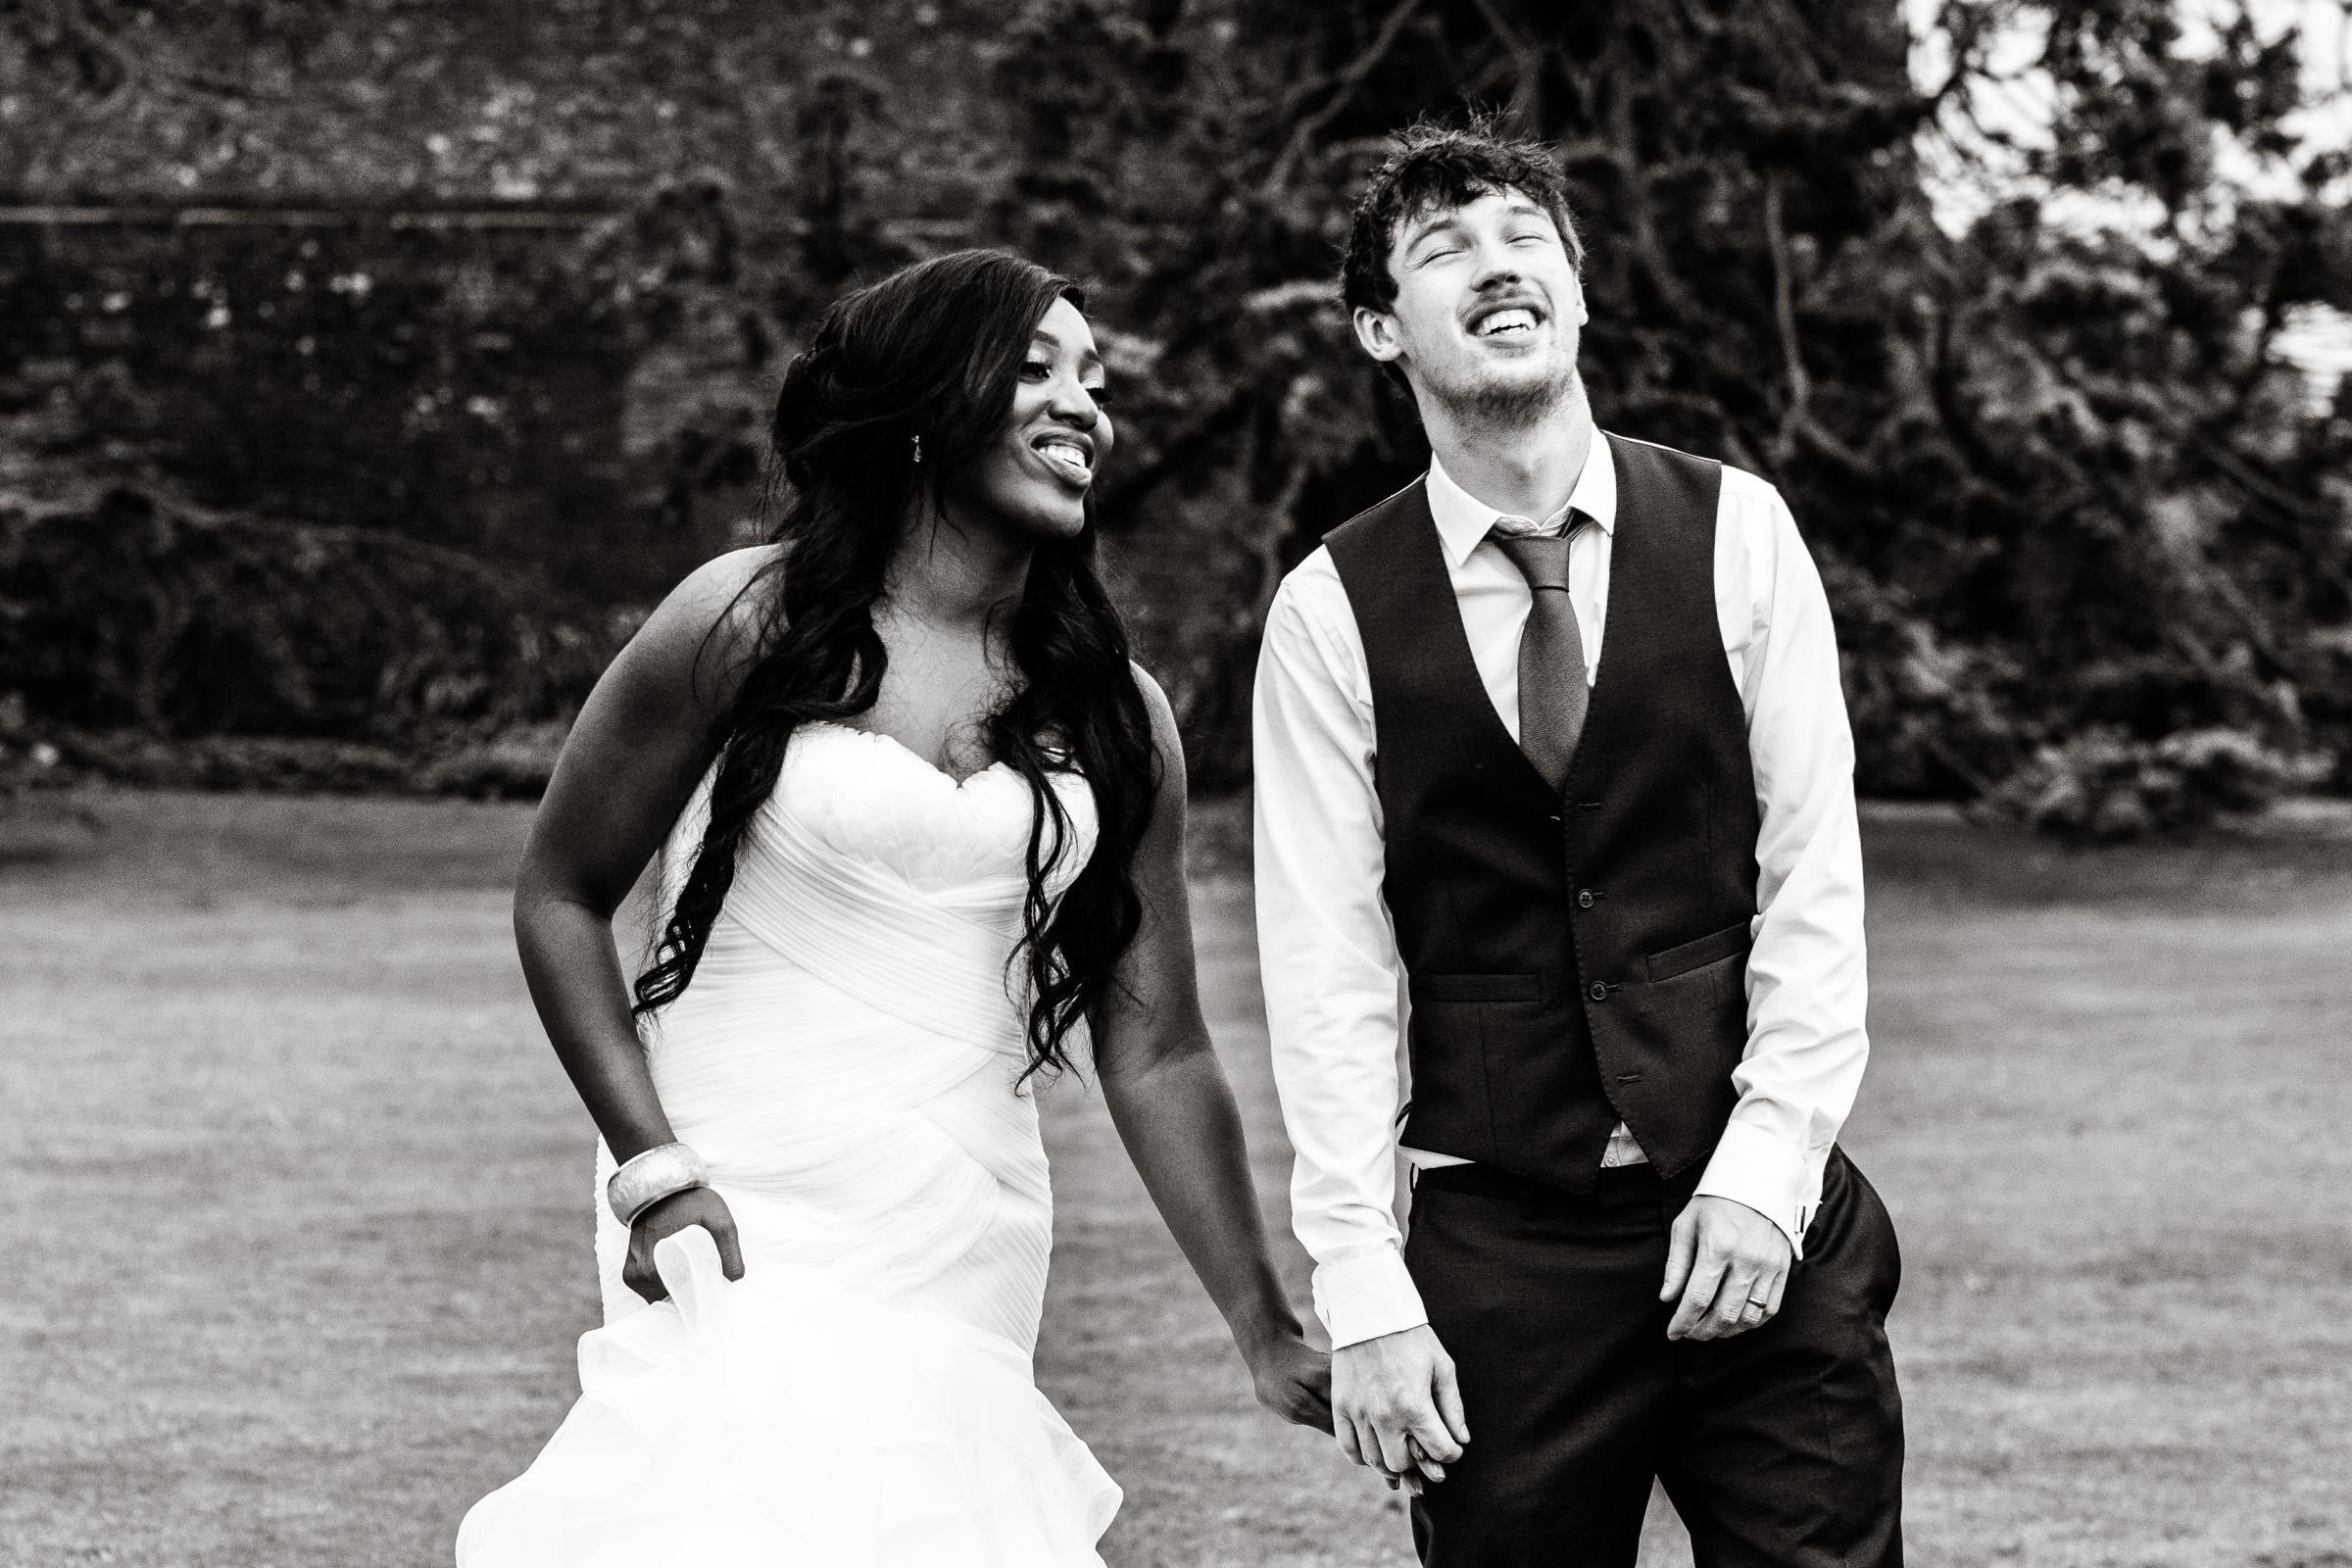 Wedding+Photography+at+Farnham+Castle+032.jpg